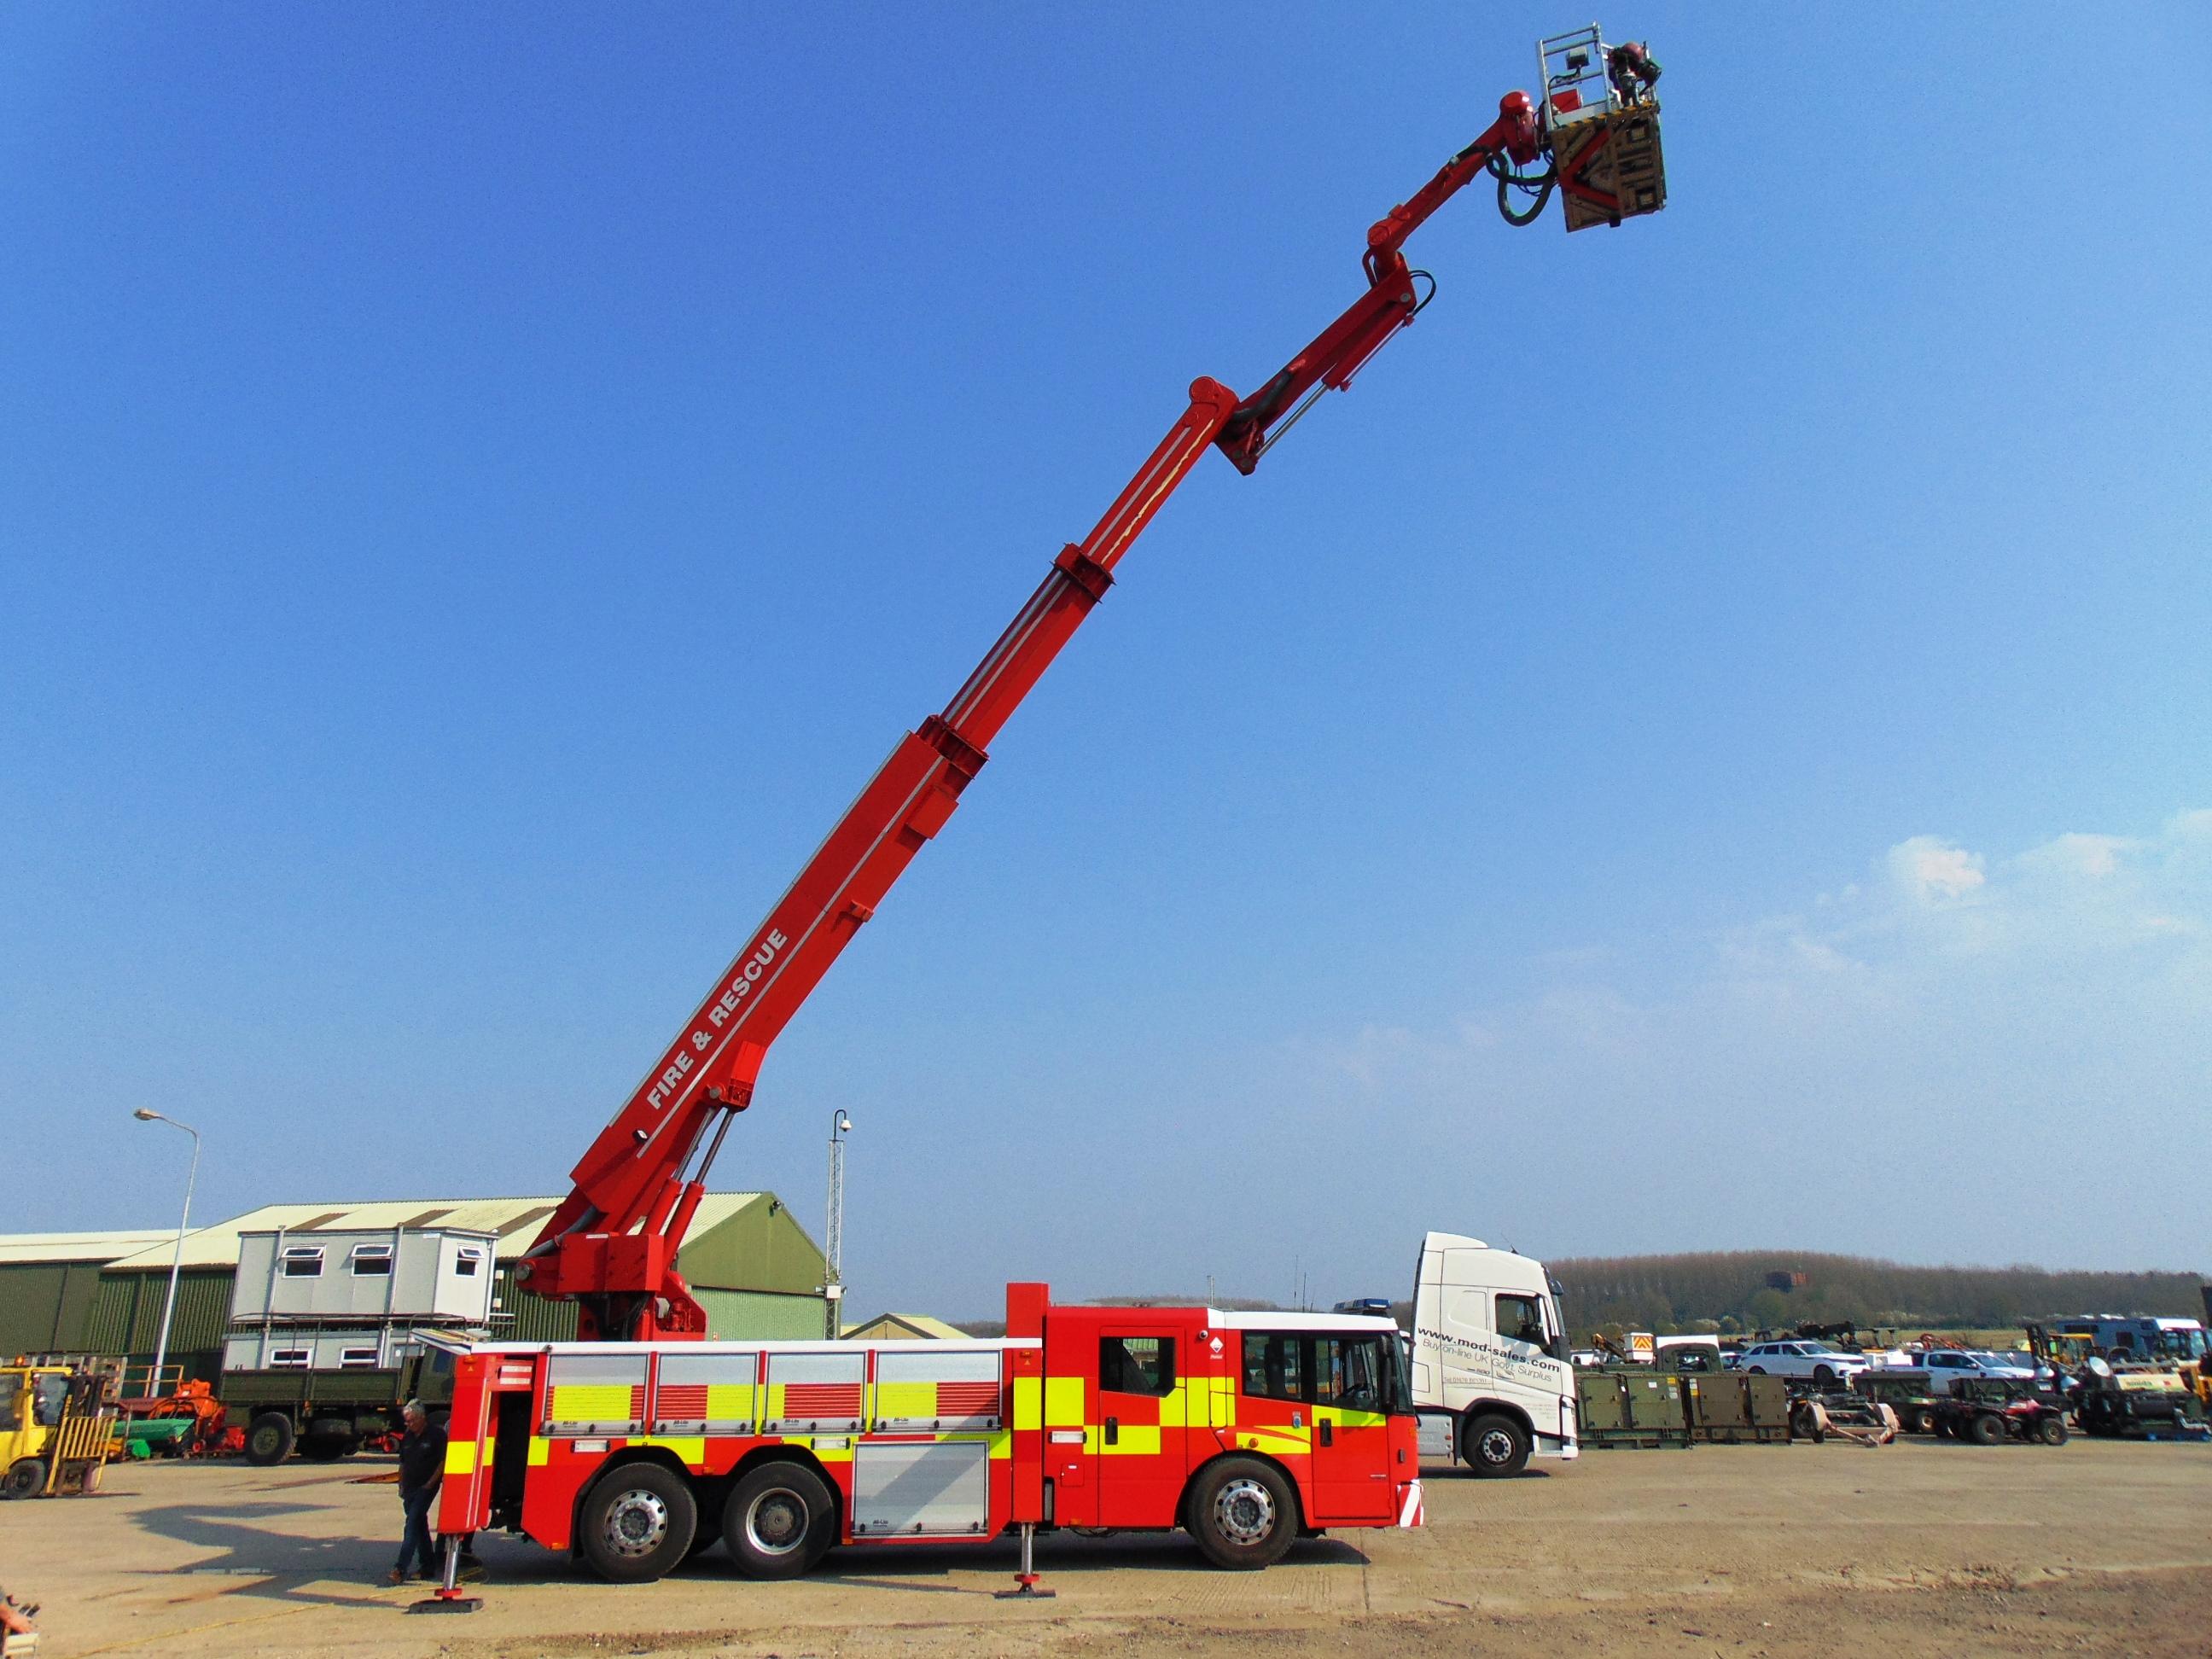 Lot 9 - 2008 Mercedes Econic 2633 CARP (Combined Aerial Rescue Pump) 6x2 Aerial Work Platform